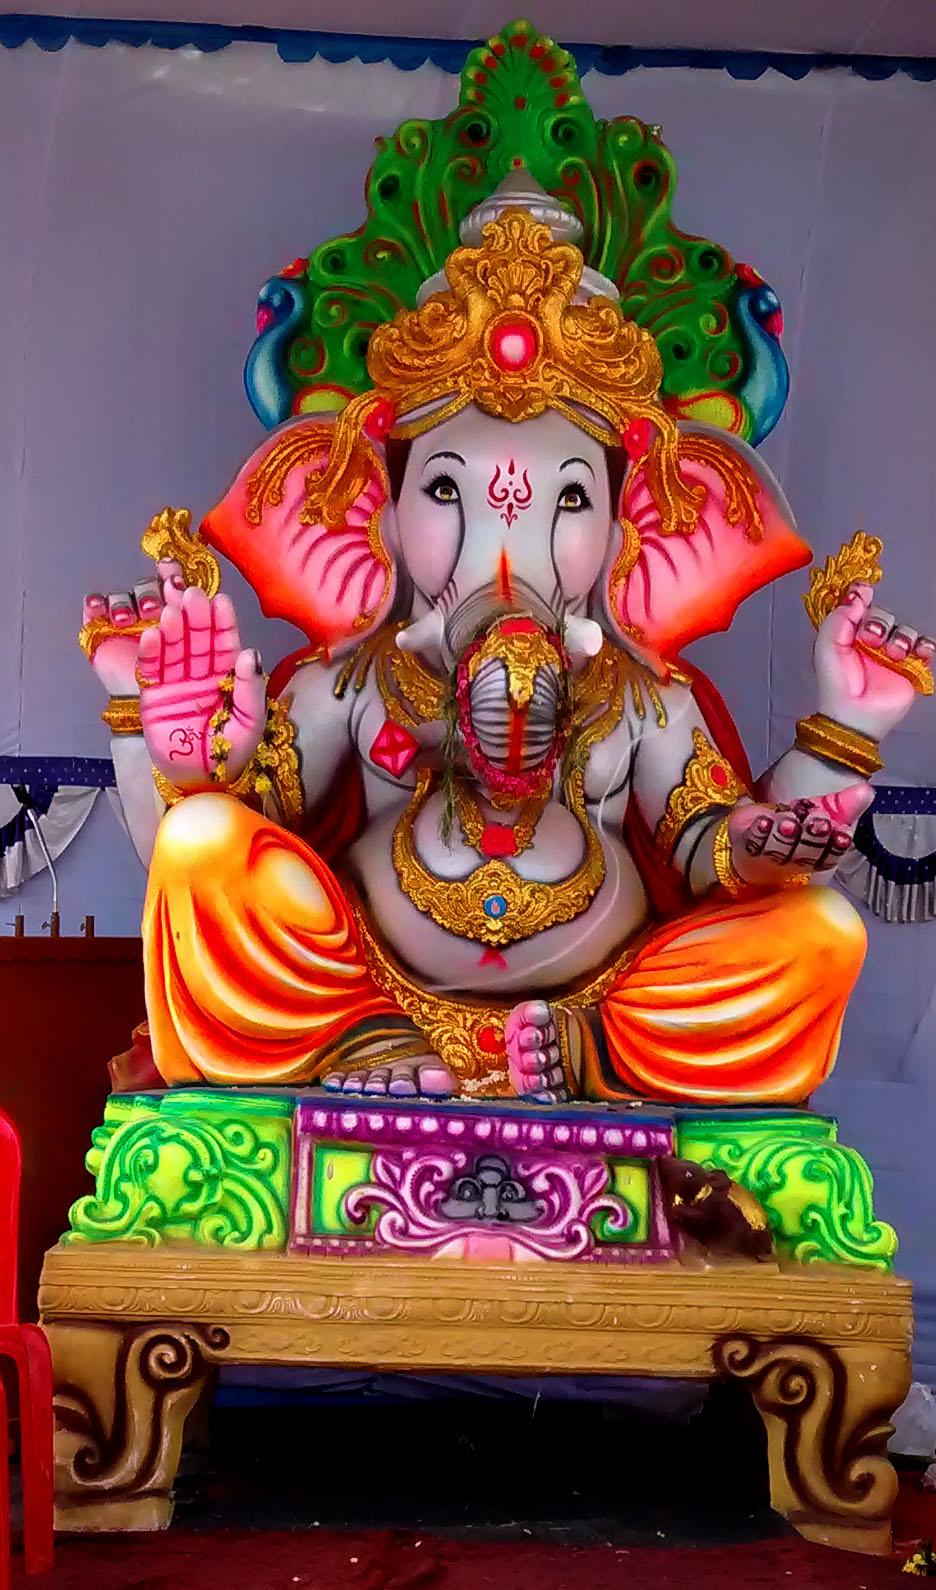 Fileganapathi Ganesha Img 20150821 110437512jpg Wikimedia Commons